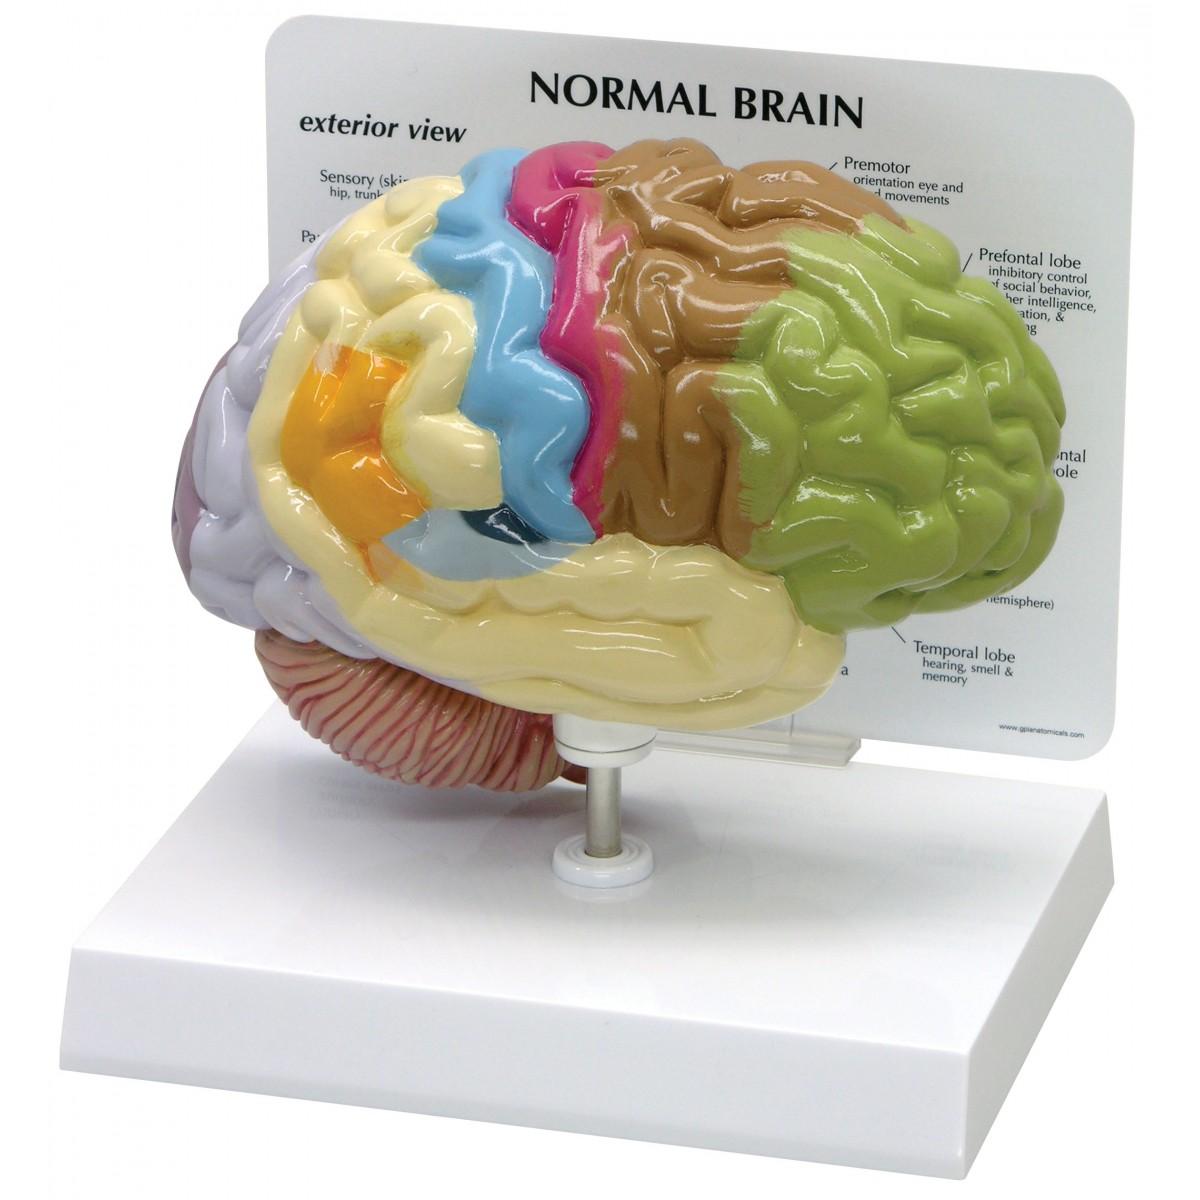 Sensory/Motor Half-Brain - Head, Brain, Nervous System - Human ...